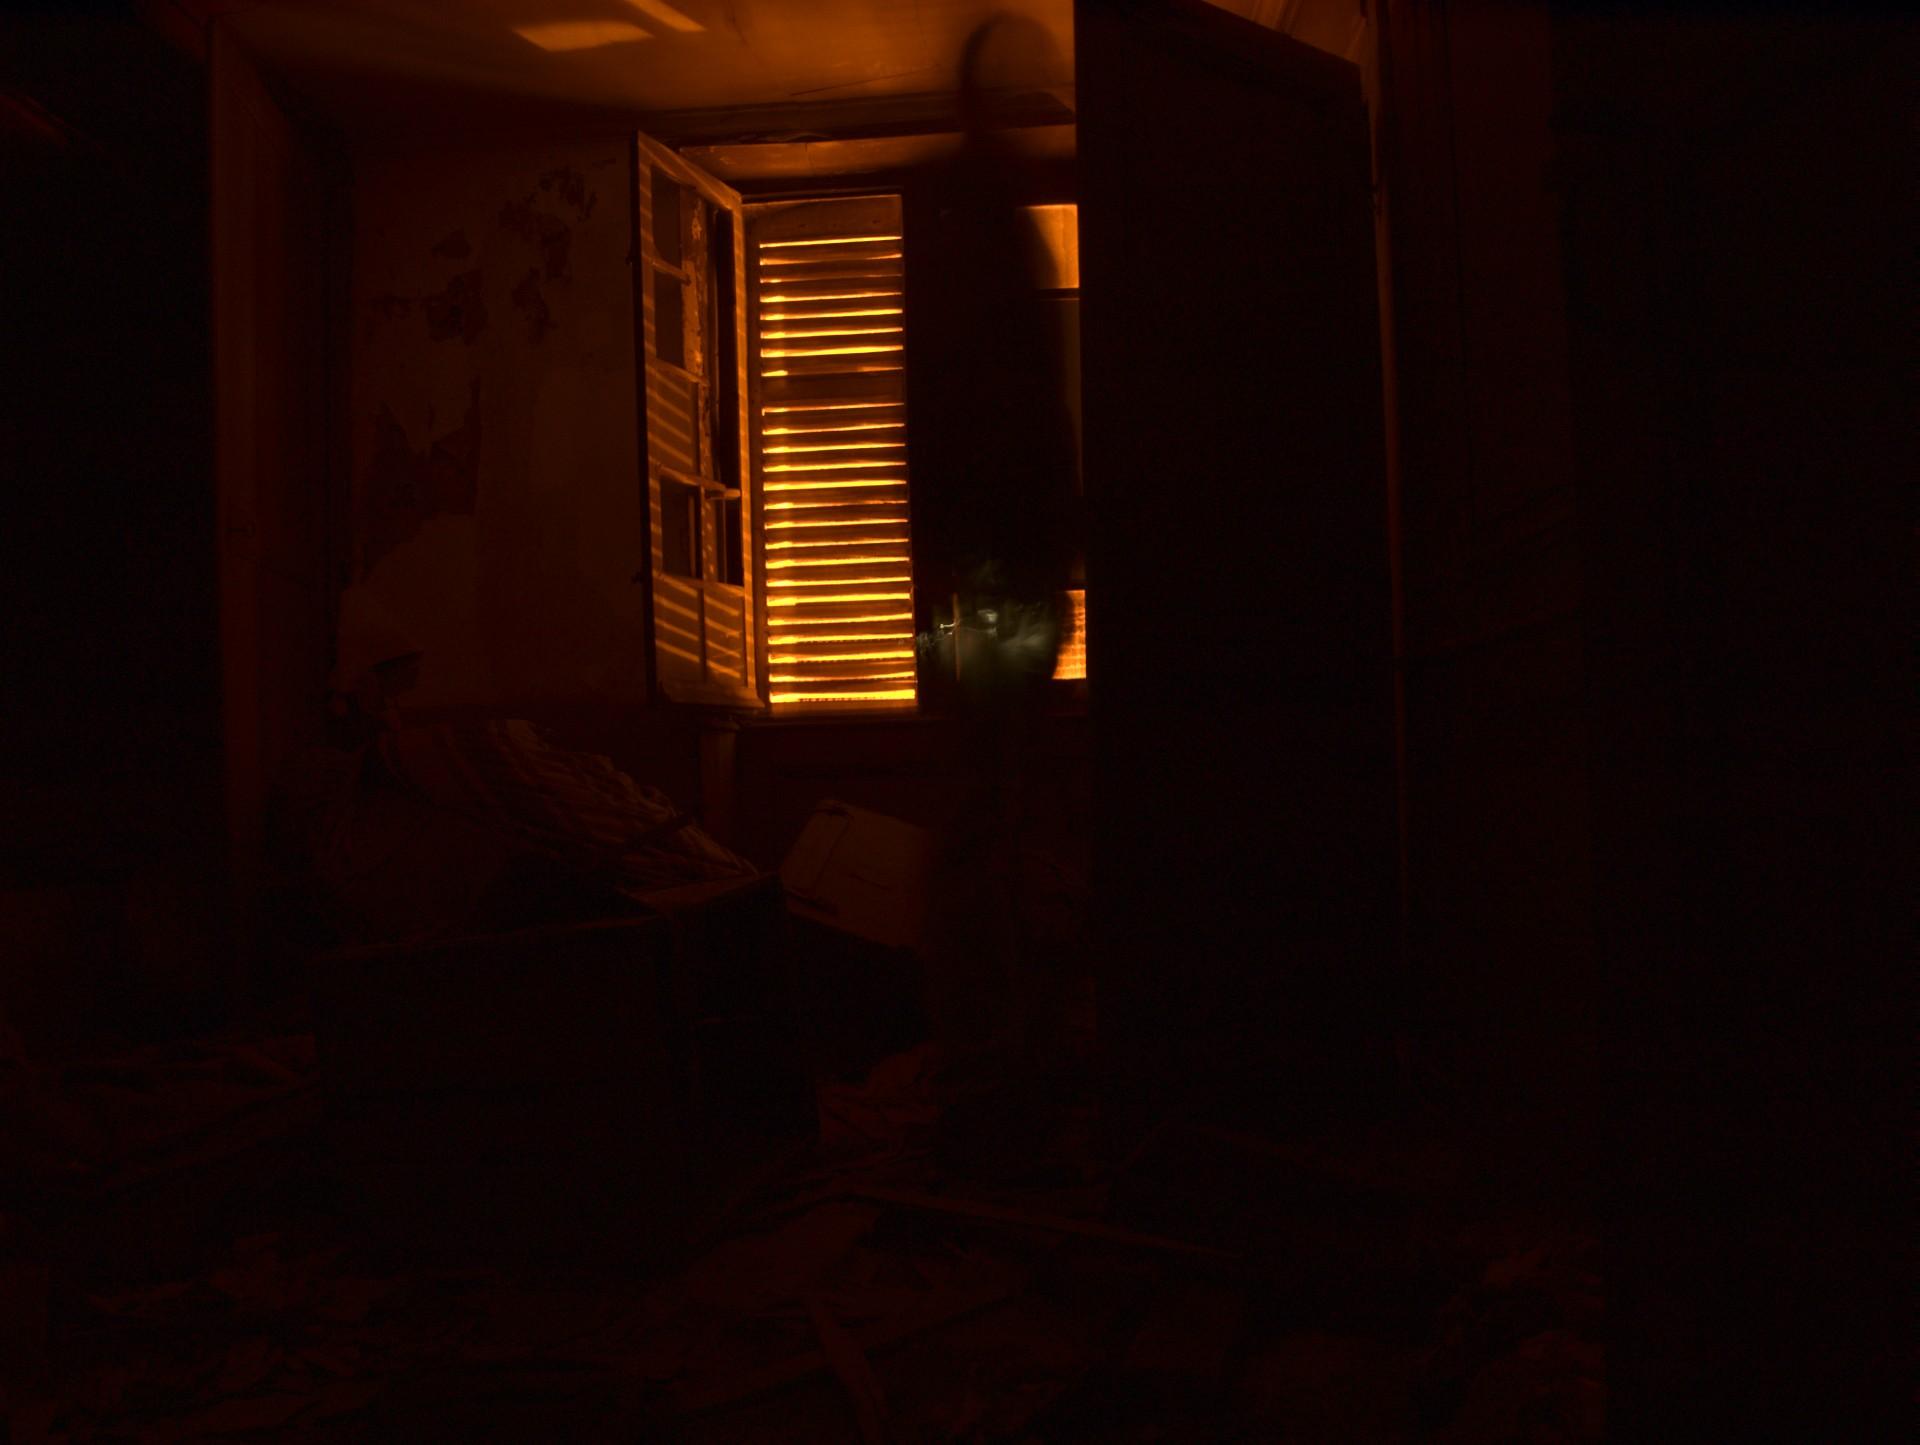 haunted House 0x07